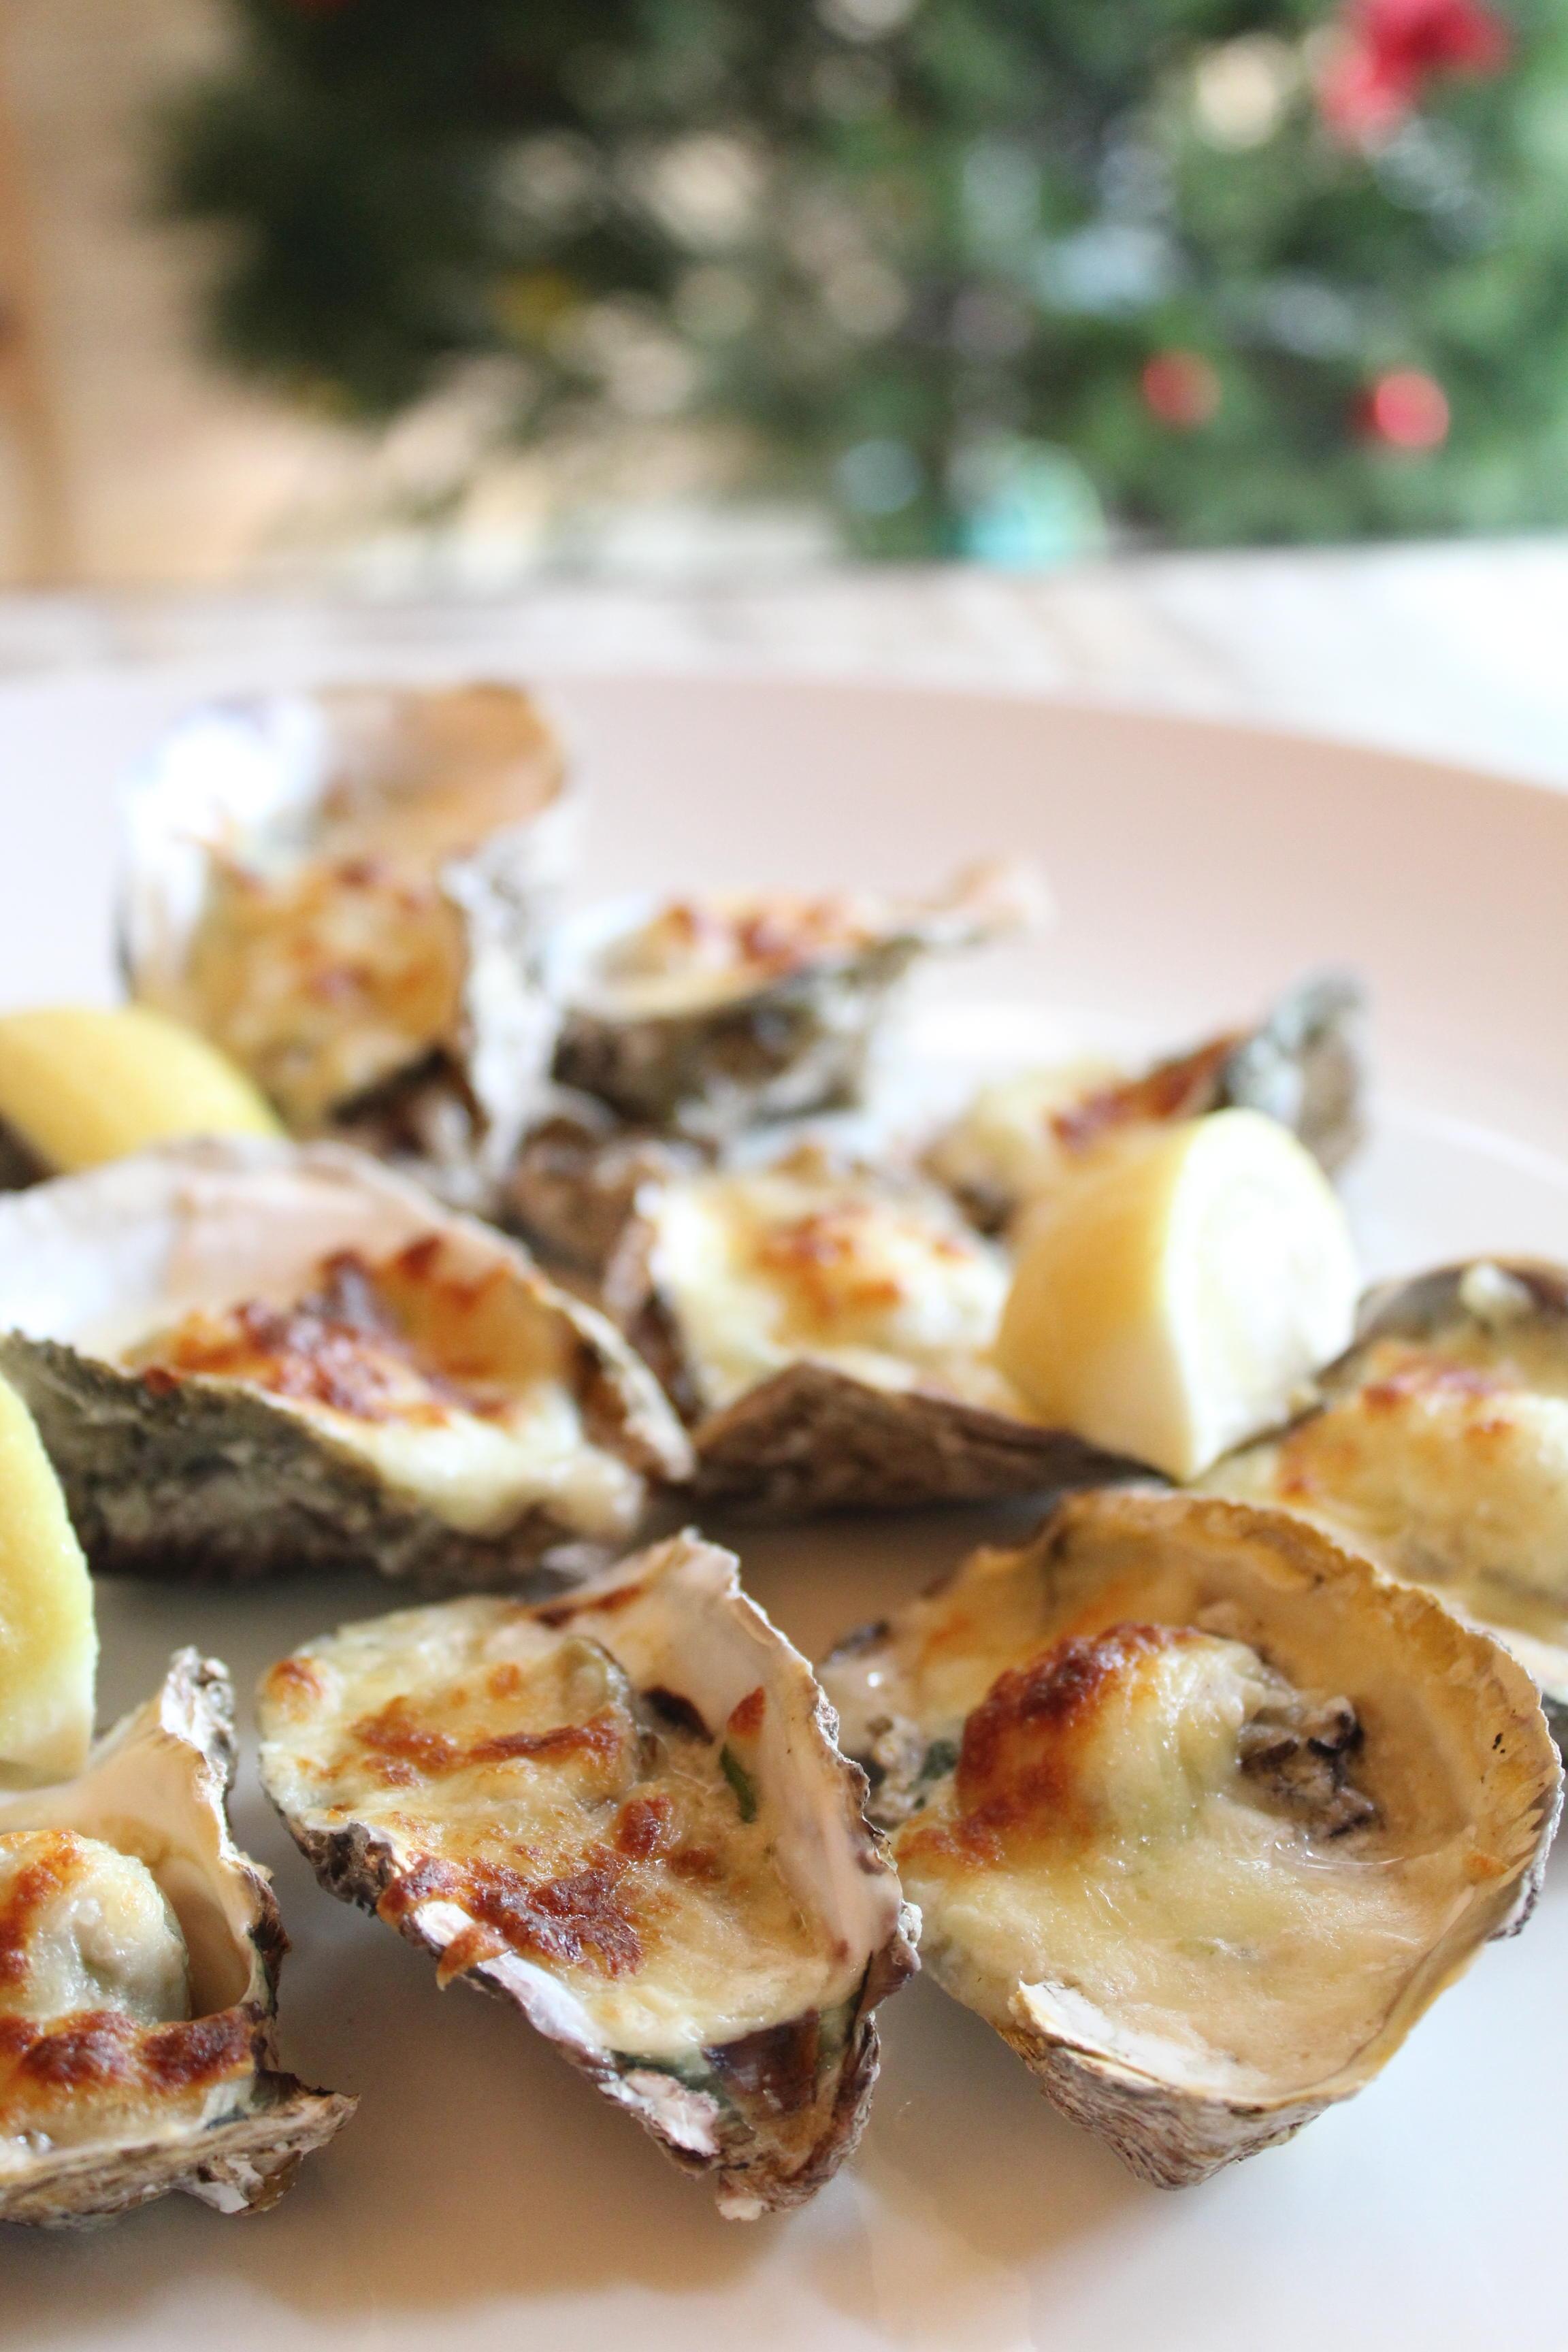 Fresh Oysters Or Baked Rockefeller